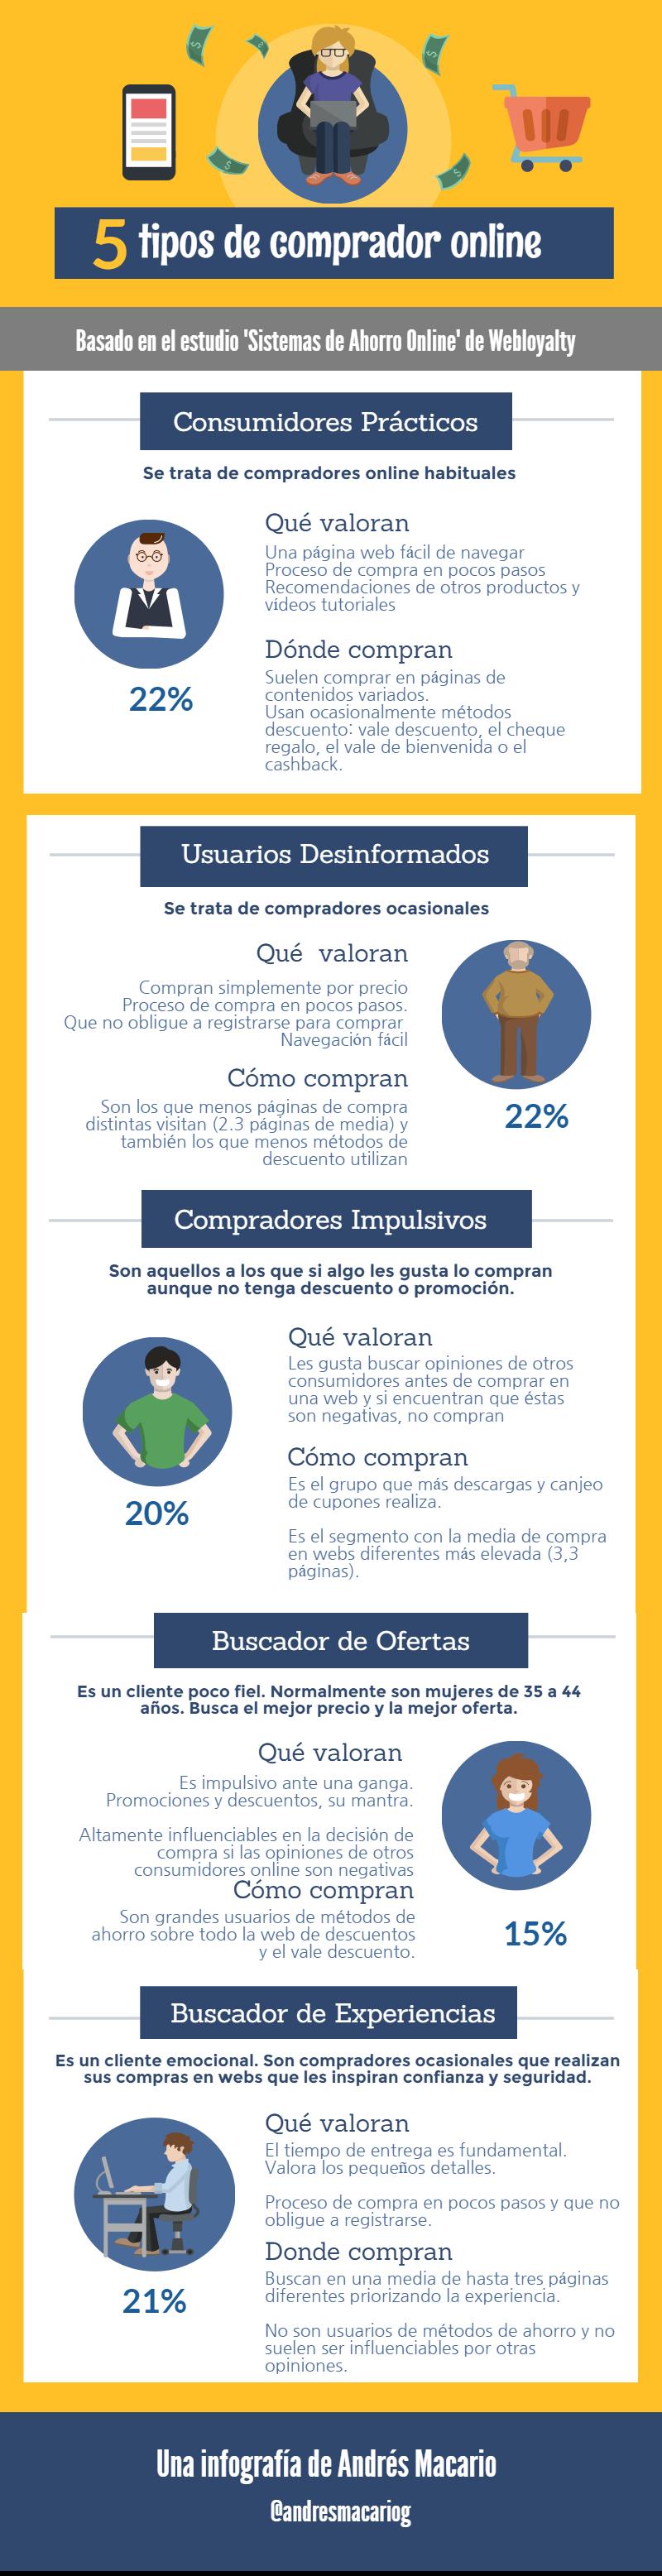 5 tipos de comprador online- Infografia Andrés Macario